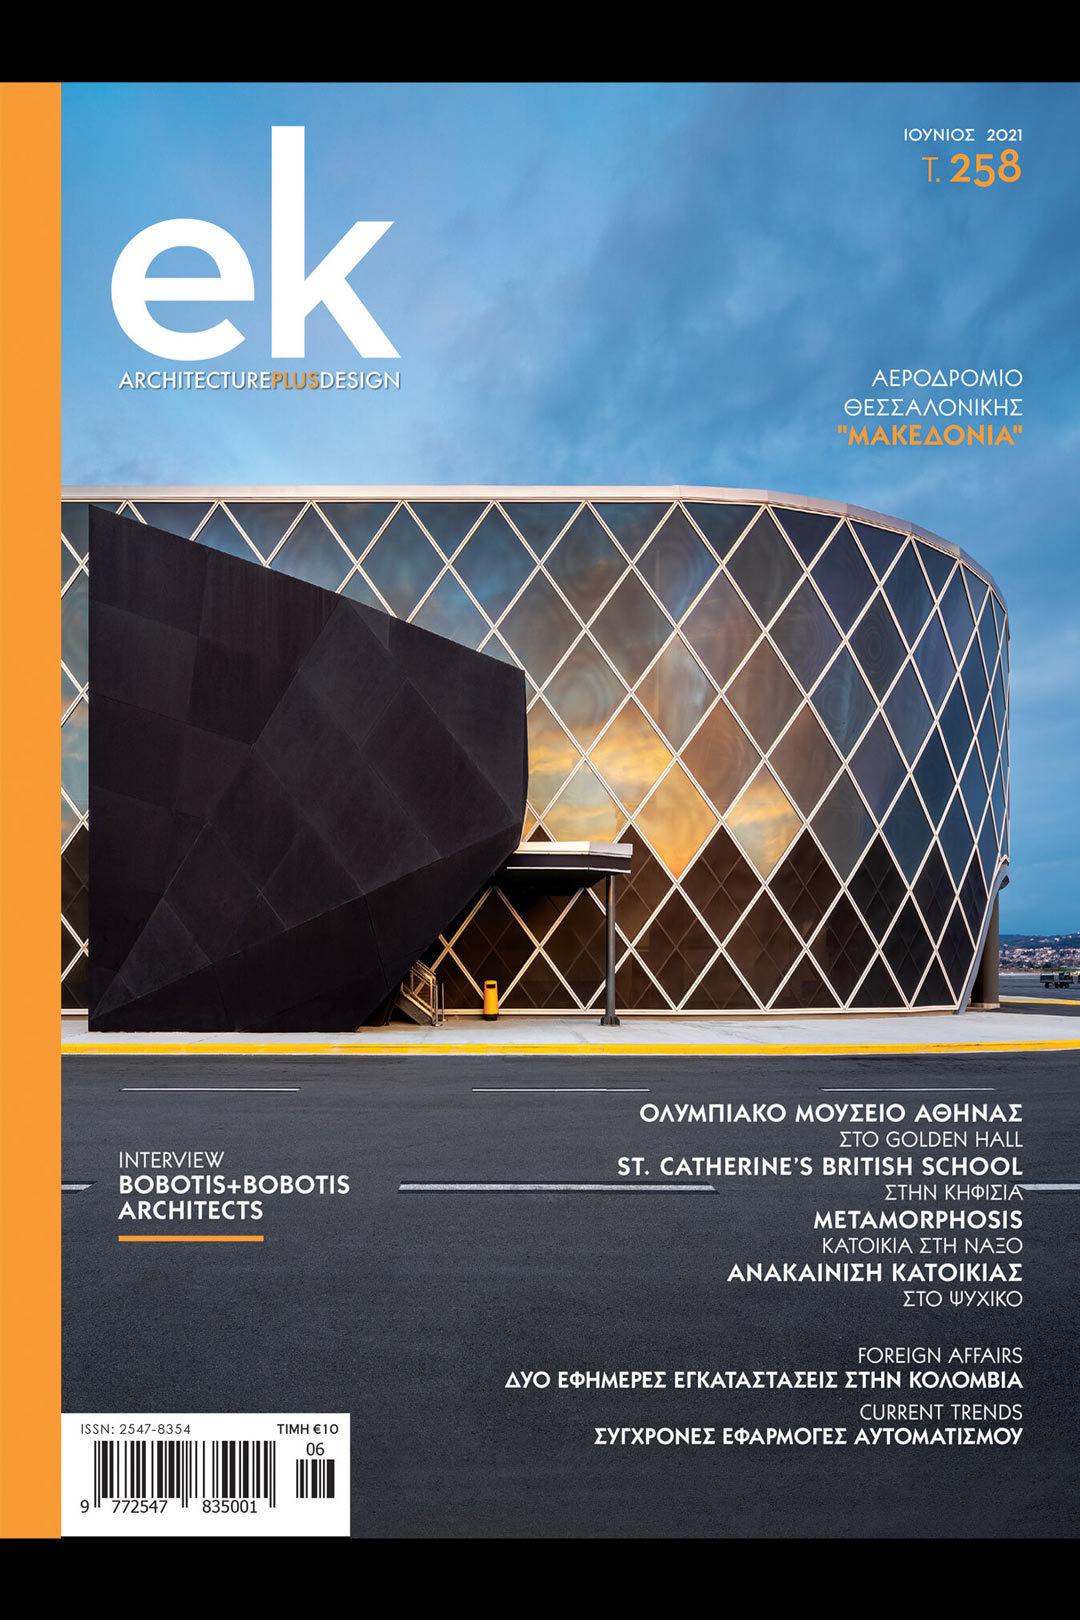 EK – SKG Airport & Bobotis+Bobotis Architects Interview